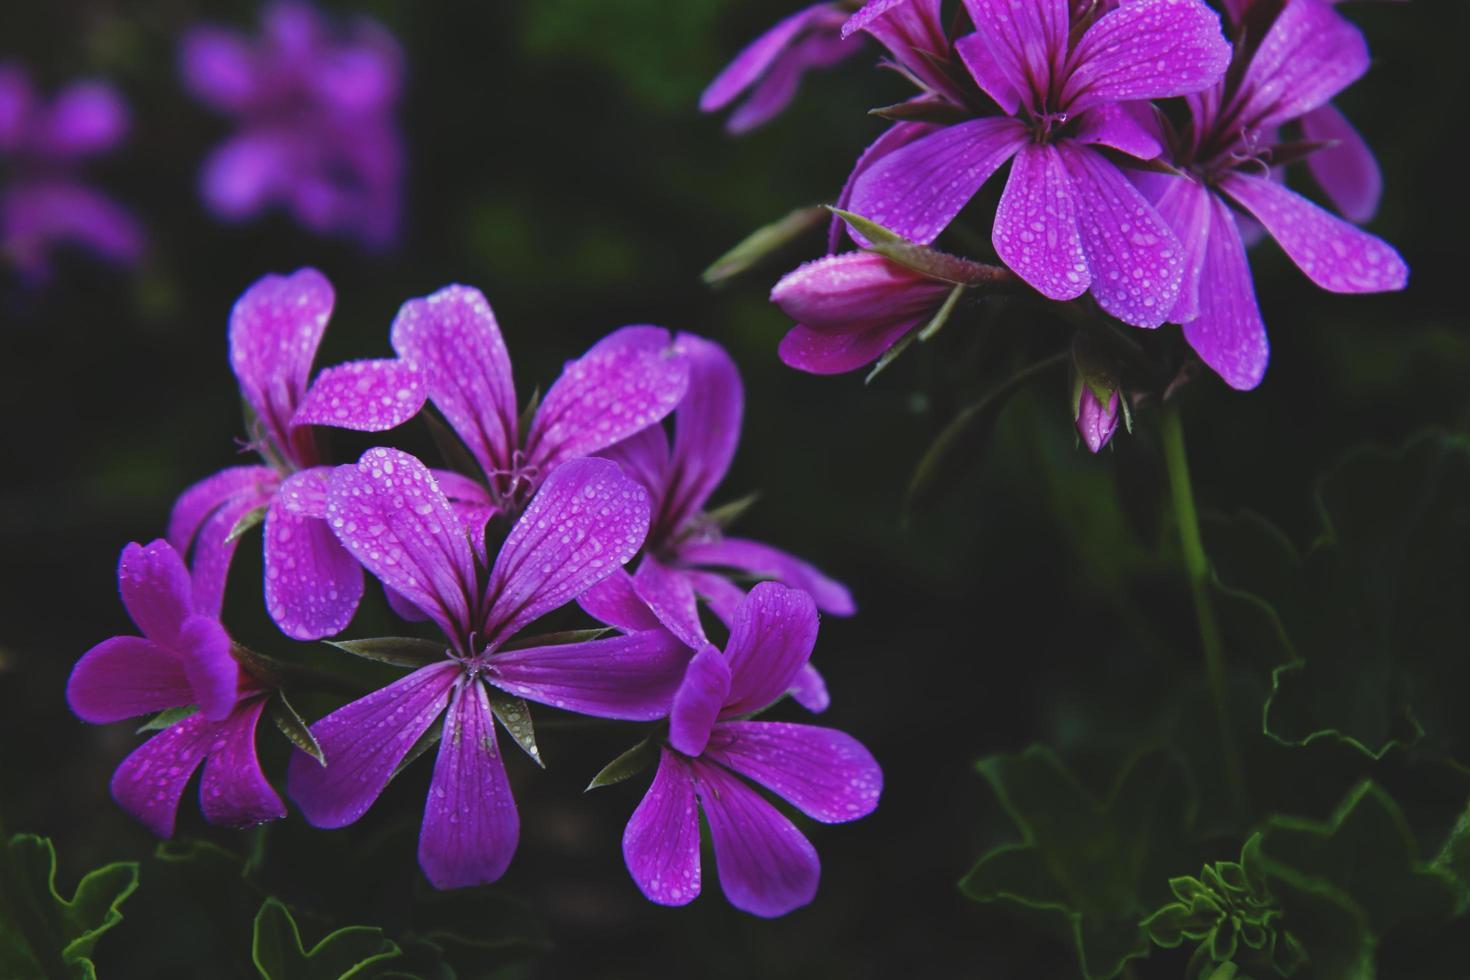 close-up van paarse petaled bloemen foto